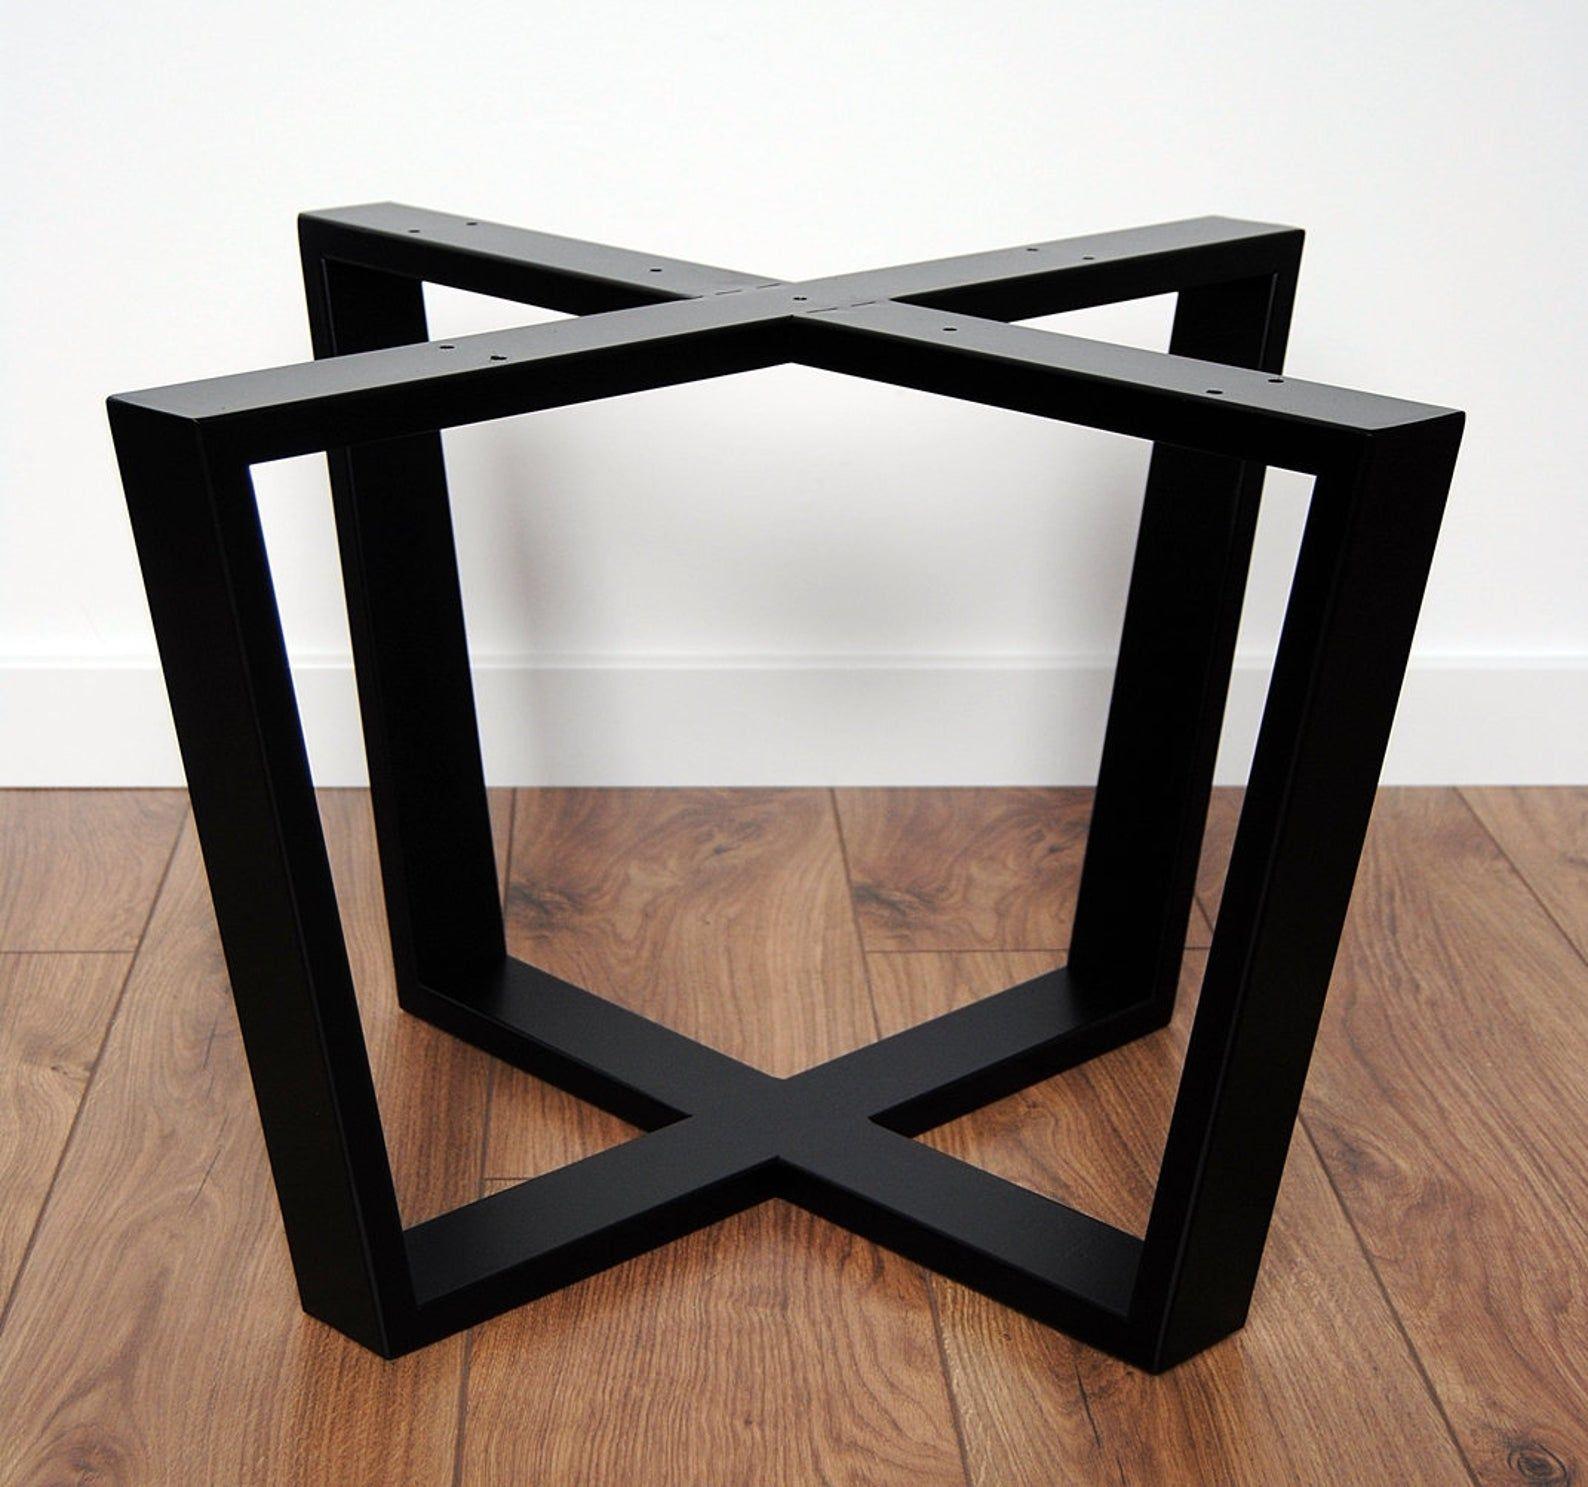 Metal Coffee Table Legs Modern Table Base Steel Table Legs Round Table Base Round Table Legs In 2020 Steel Table Legs Table Legs Modern Table Base [ 1487 x 1588 Pixel ]